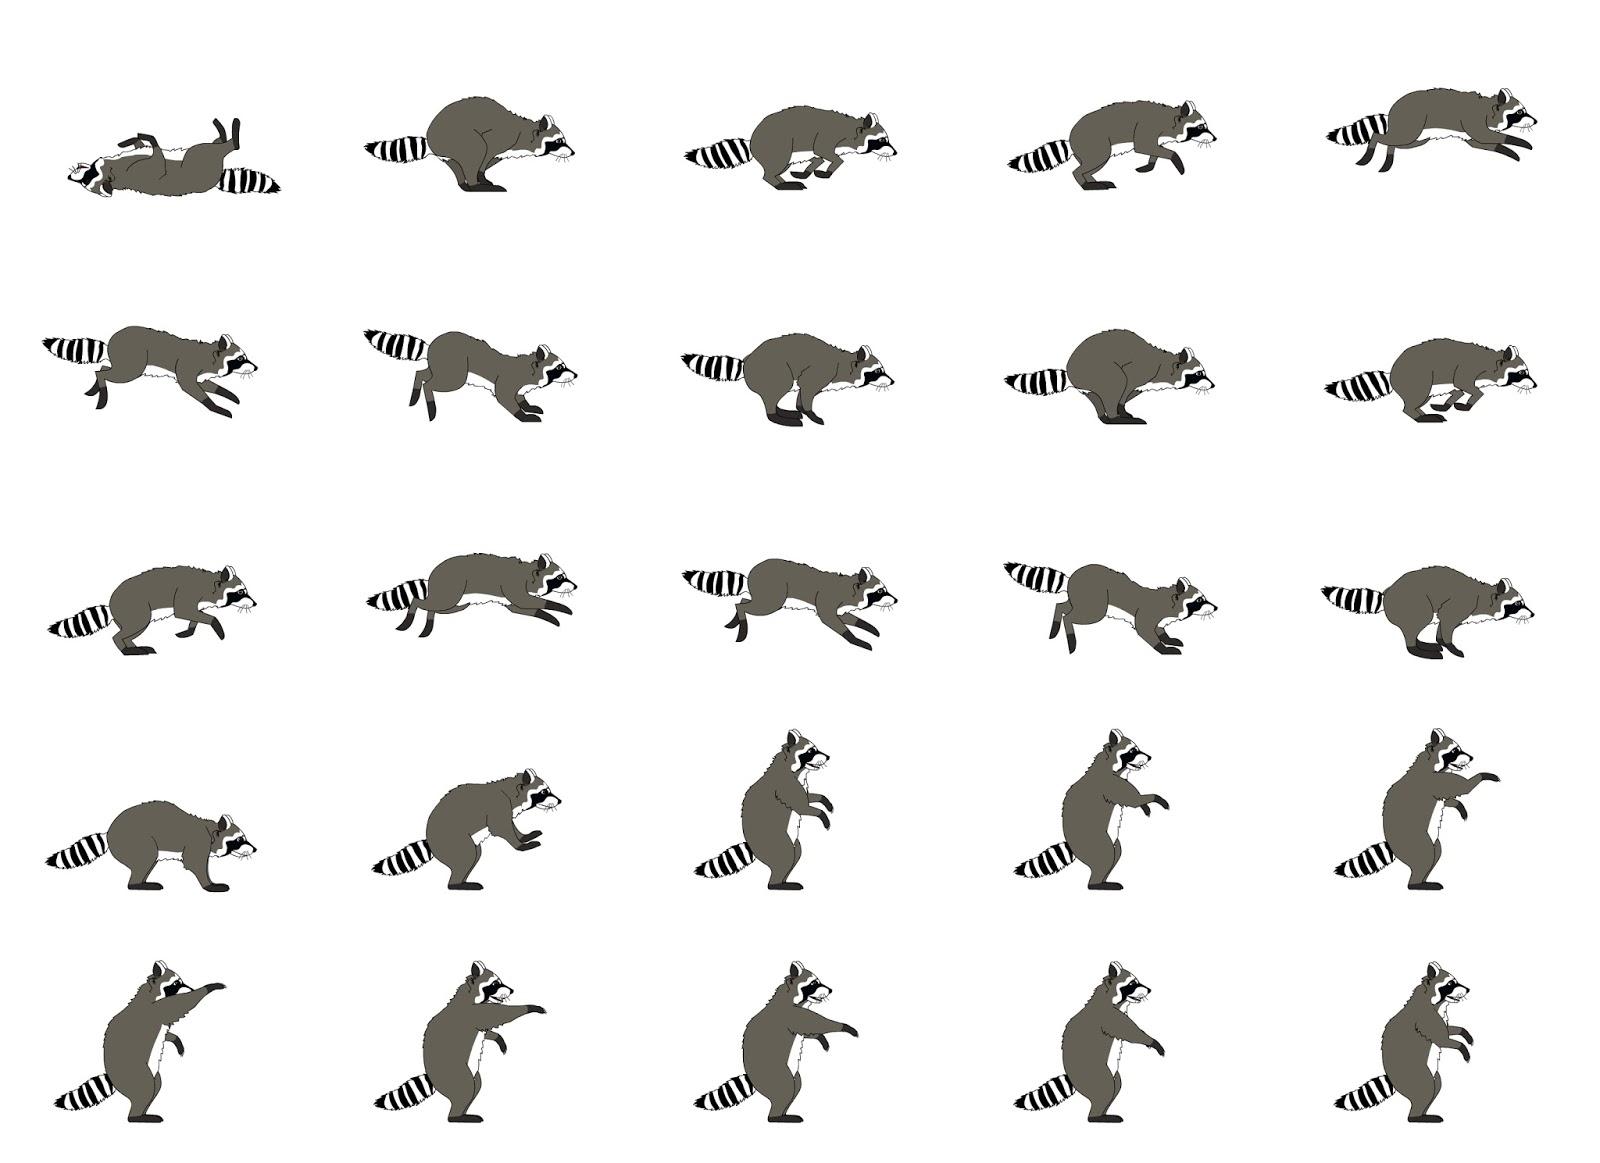 Sarath Kumar 2d Flash Animator Designs And Animations